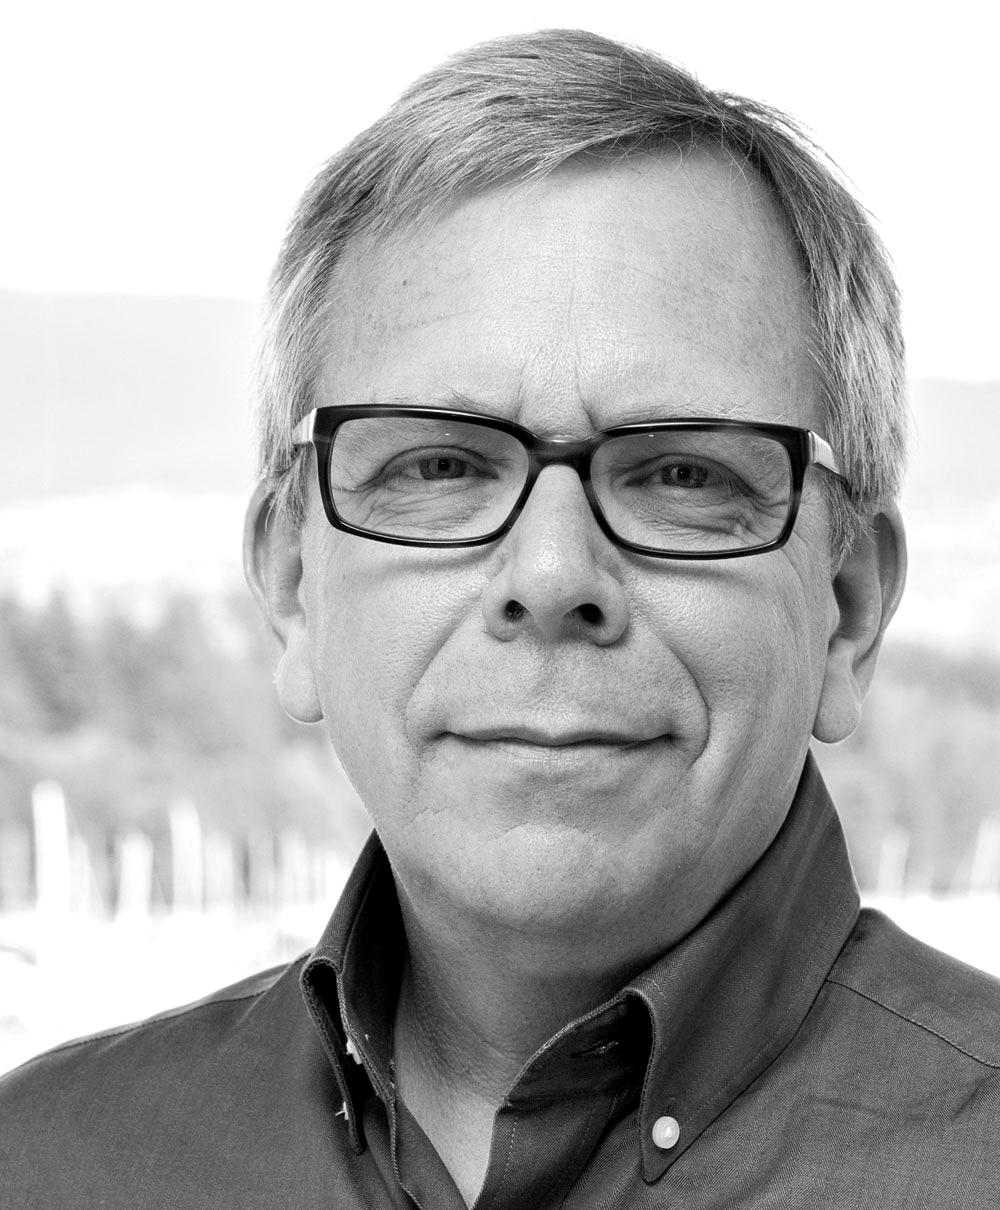 Headshot of Jeff Christianson